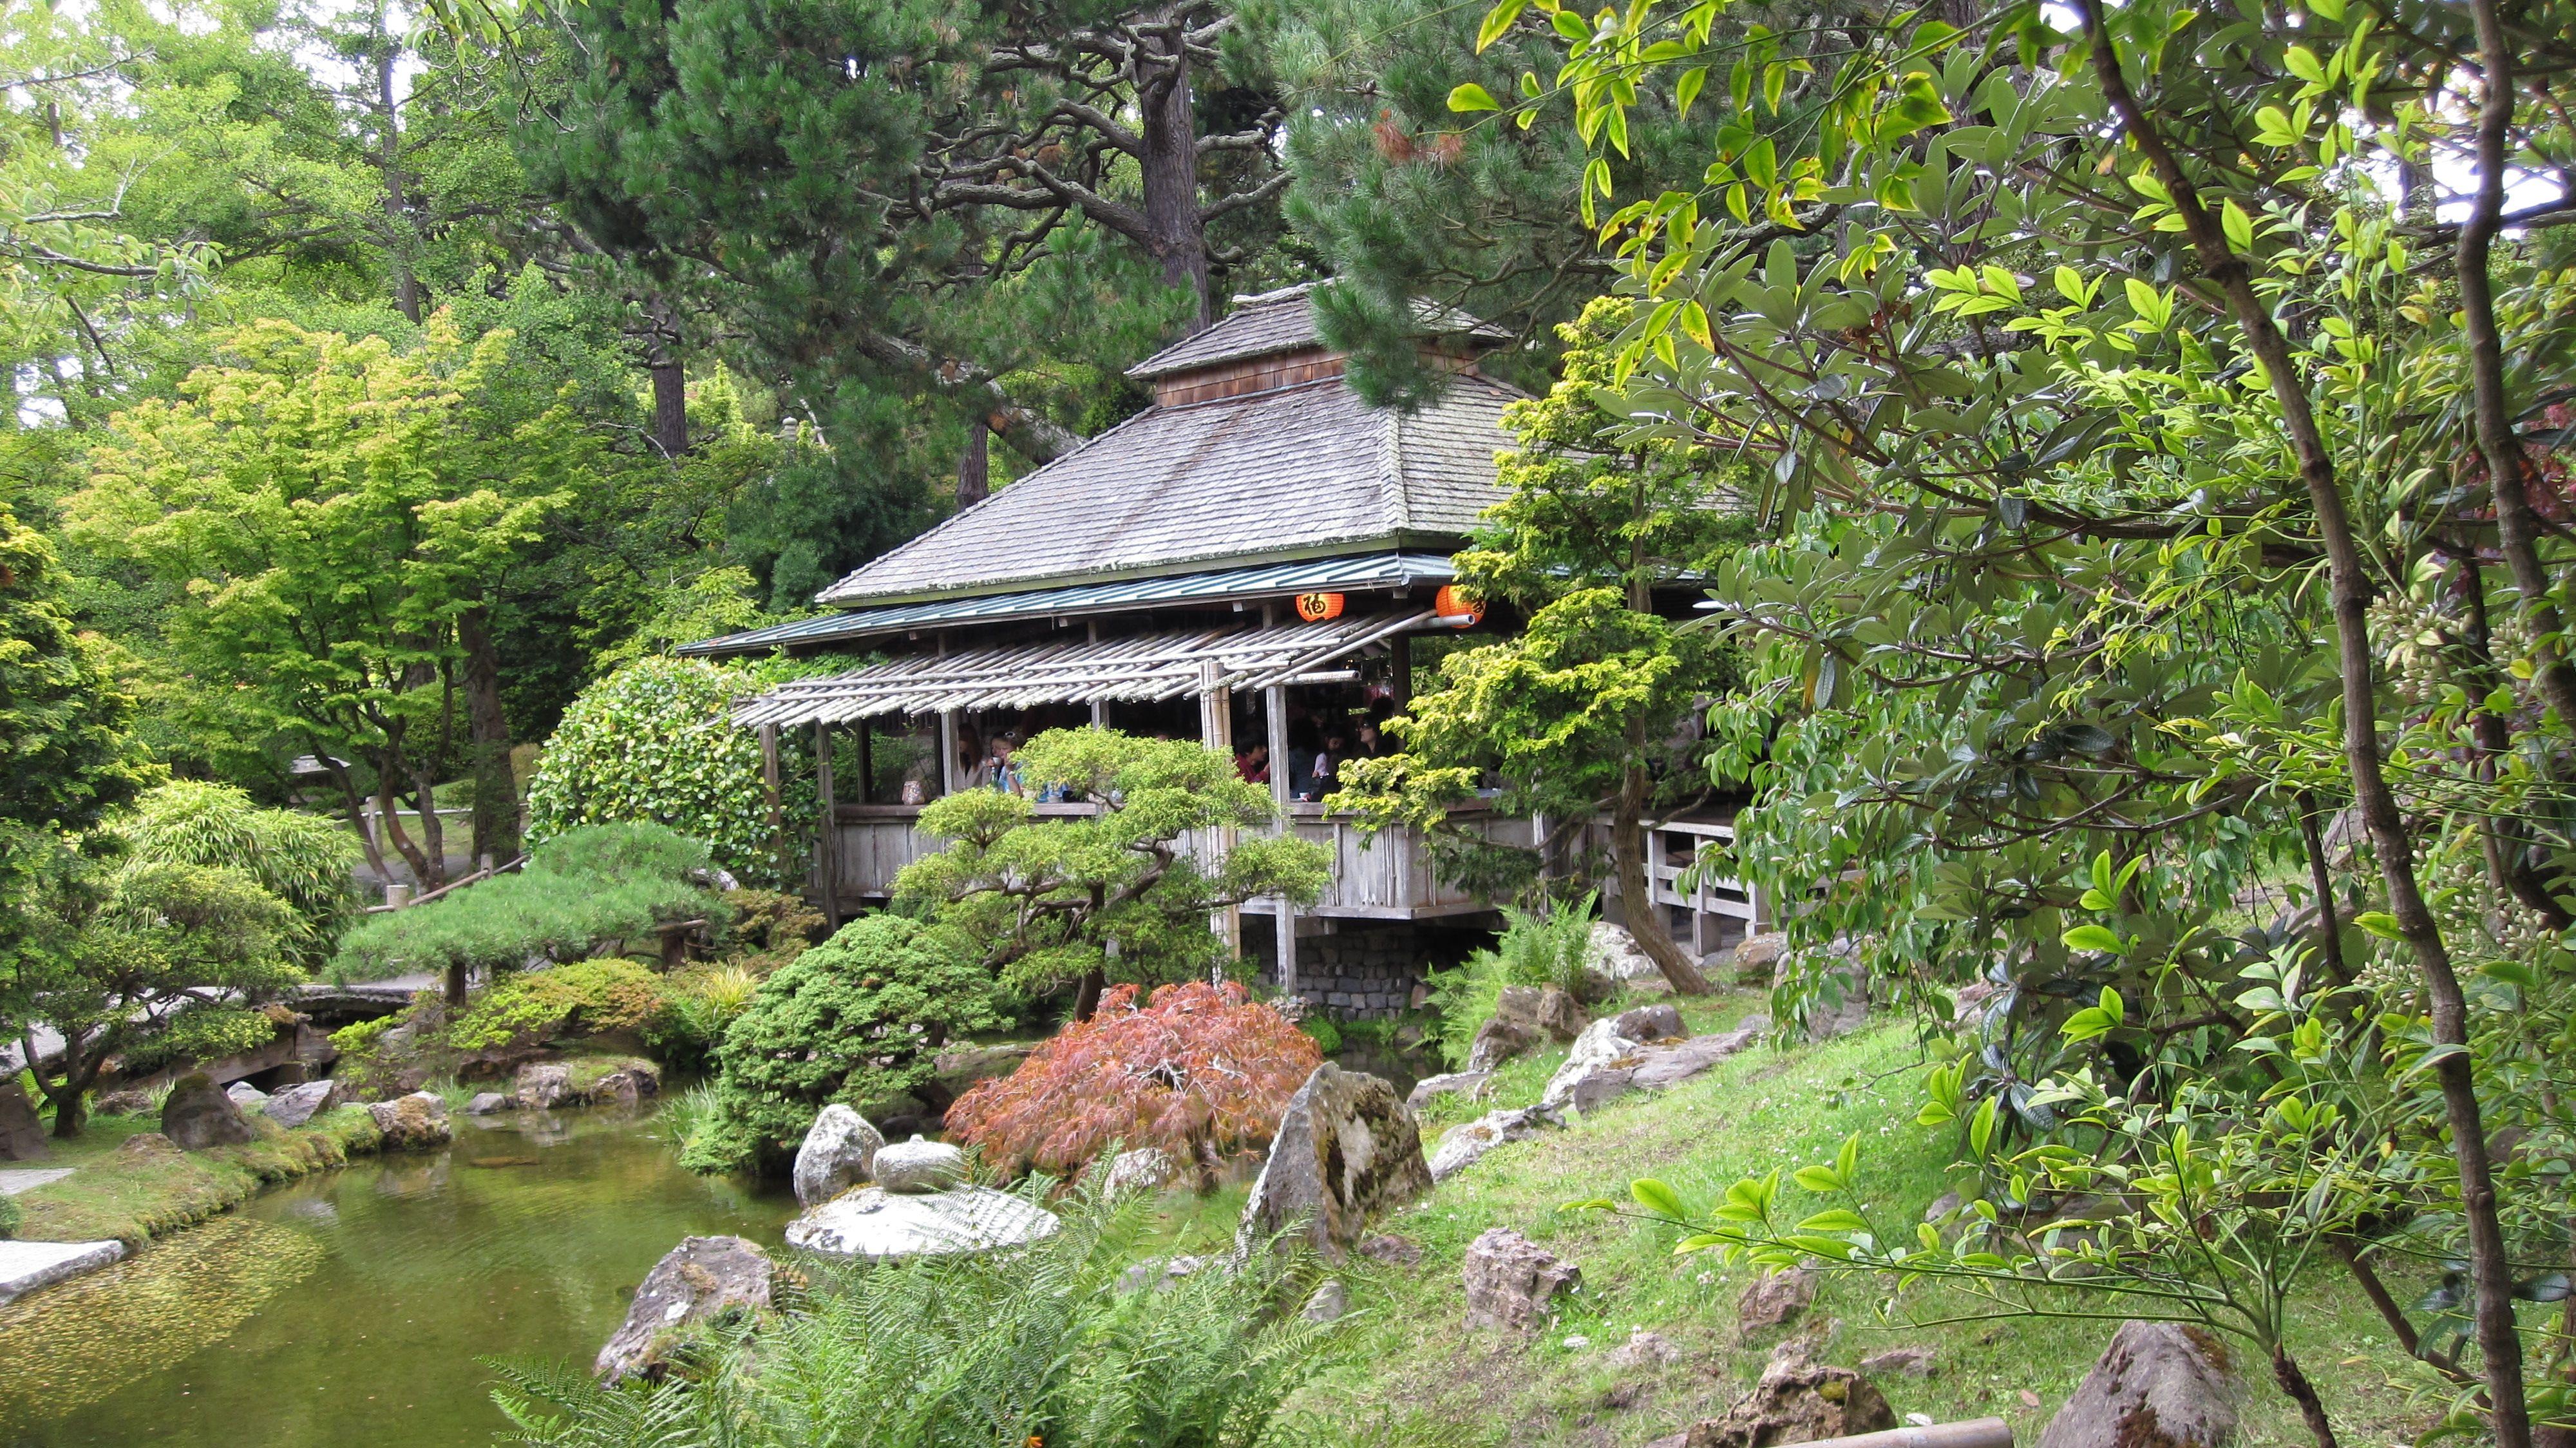 Japanese Tea House Japanese garden, gardens